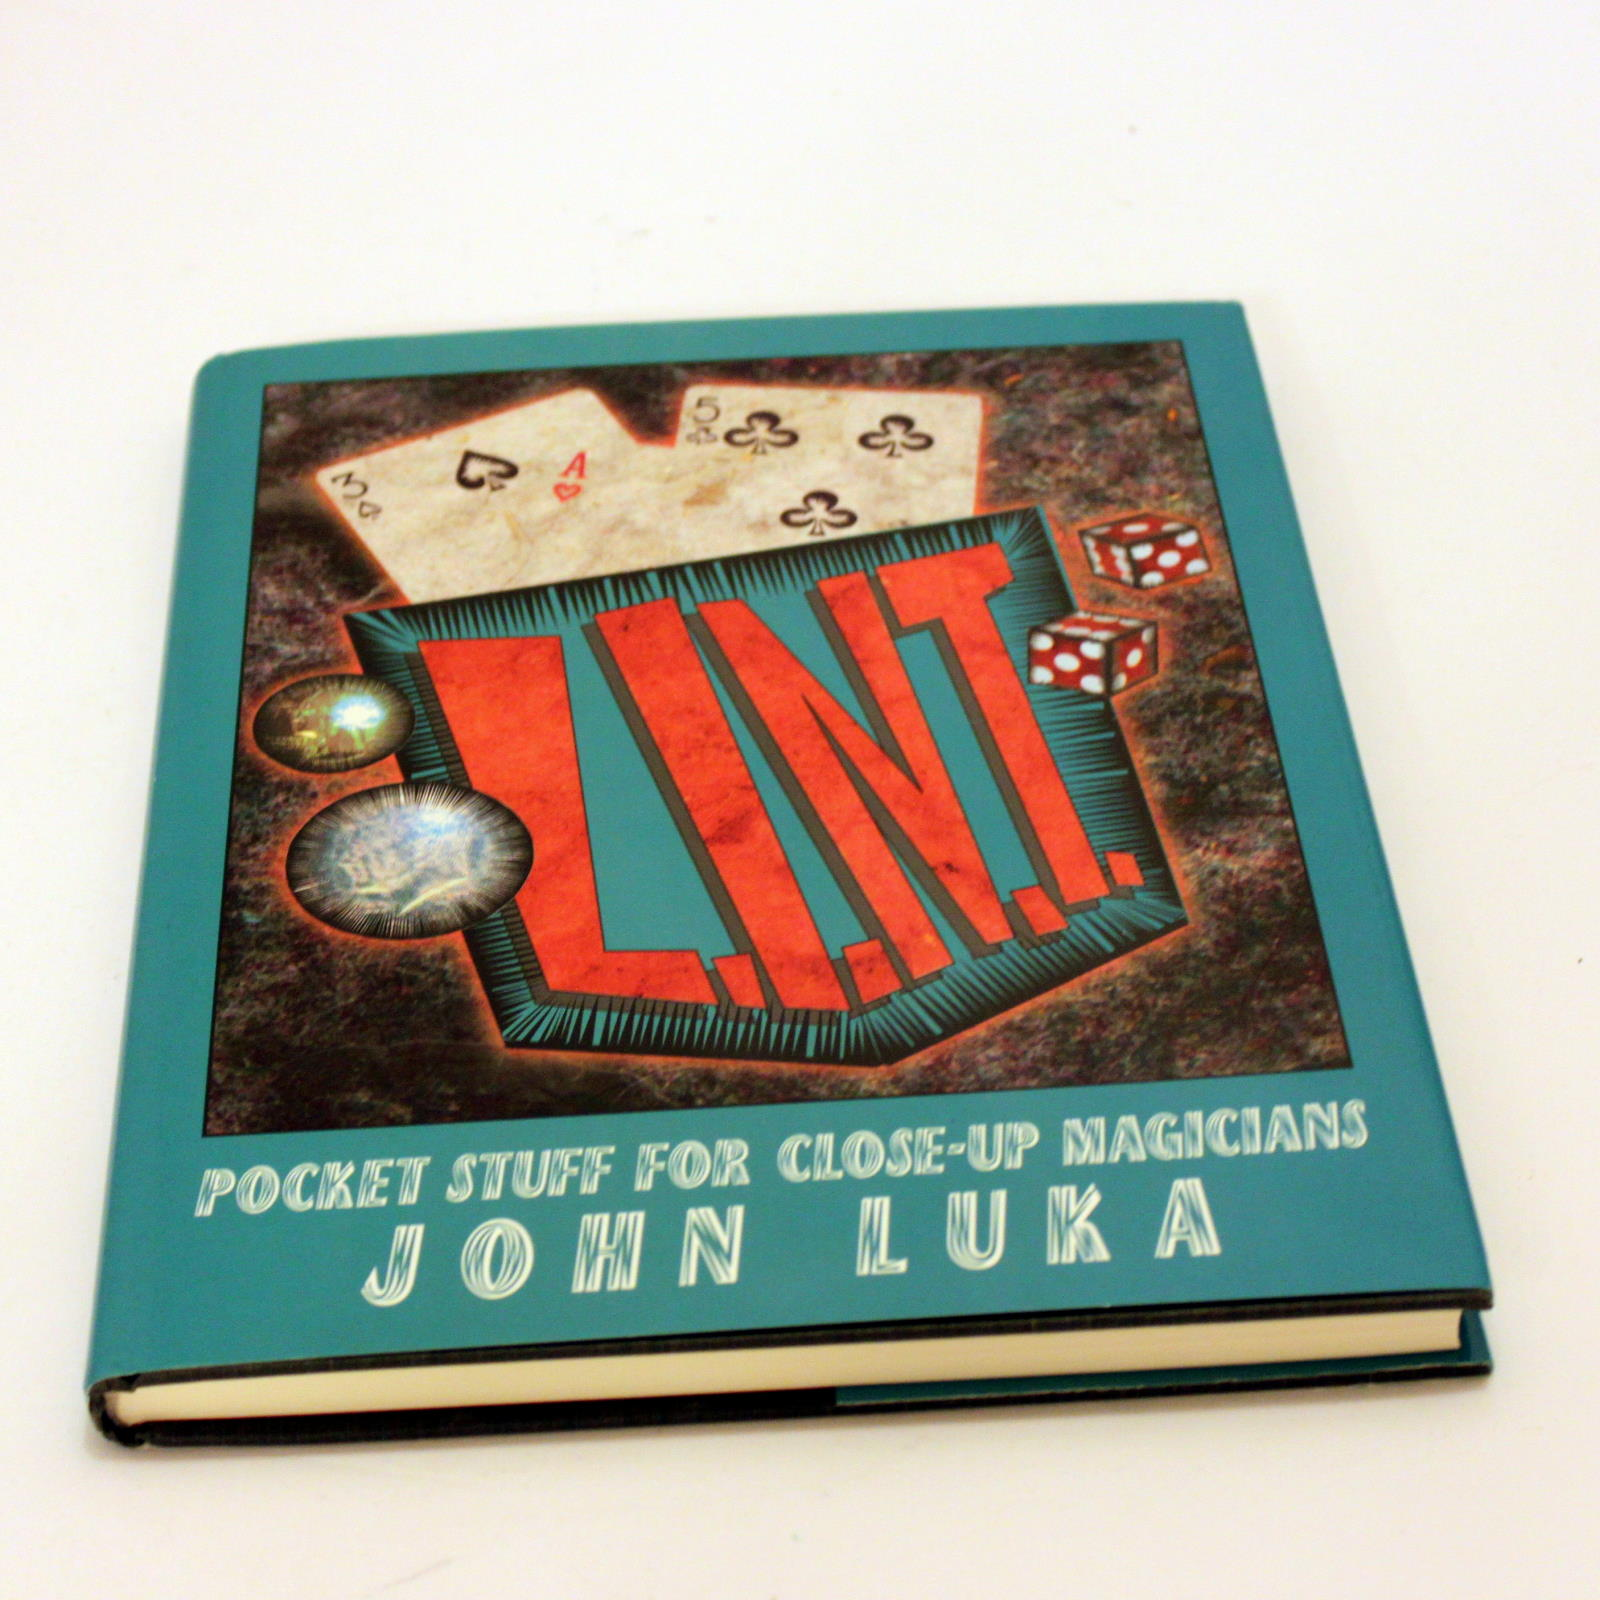 L.I.N.T. Pocket Stuff for Close-Up Magicians by John Luka